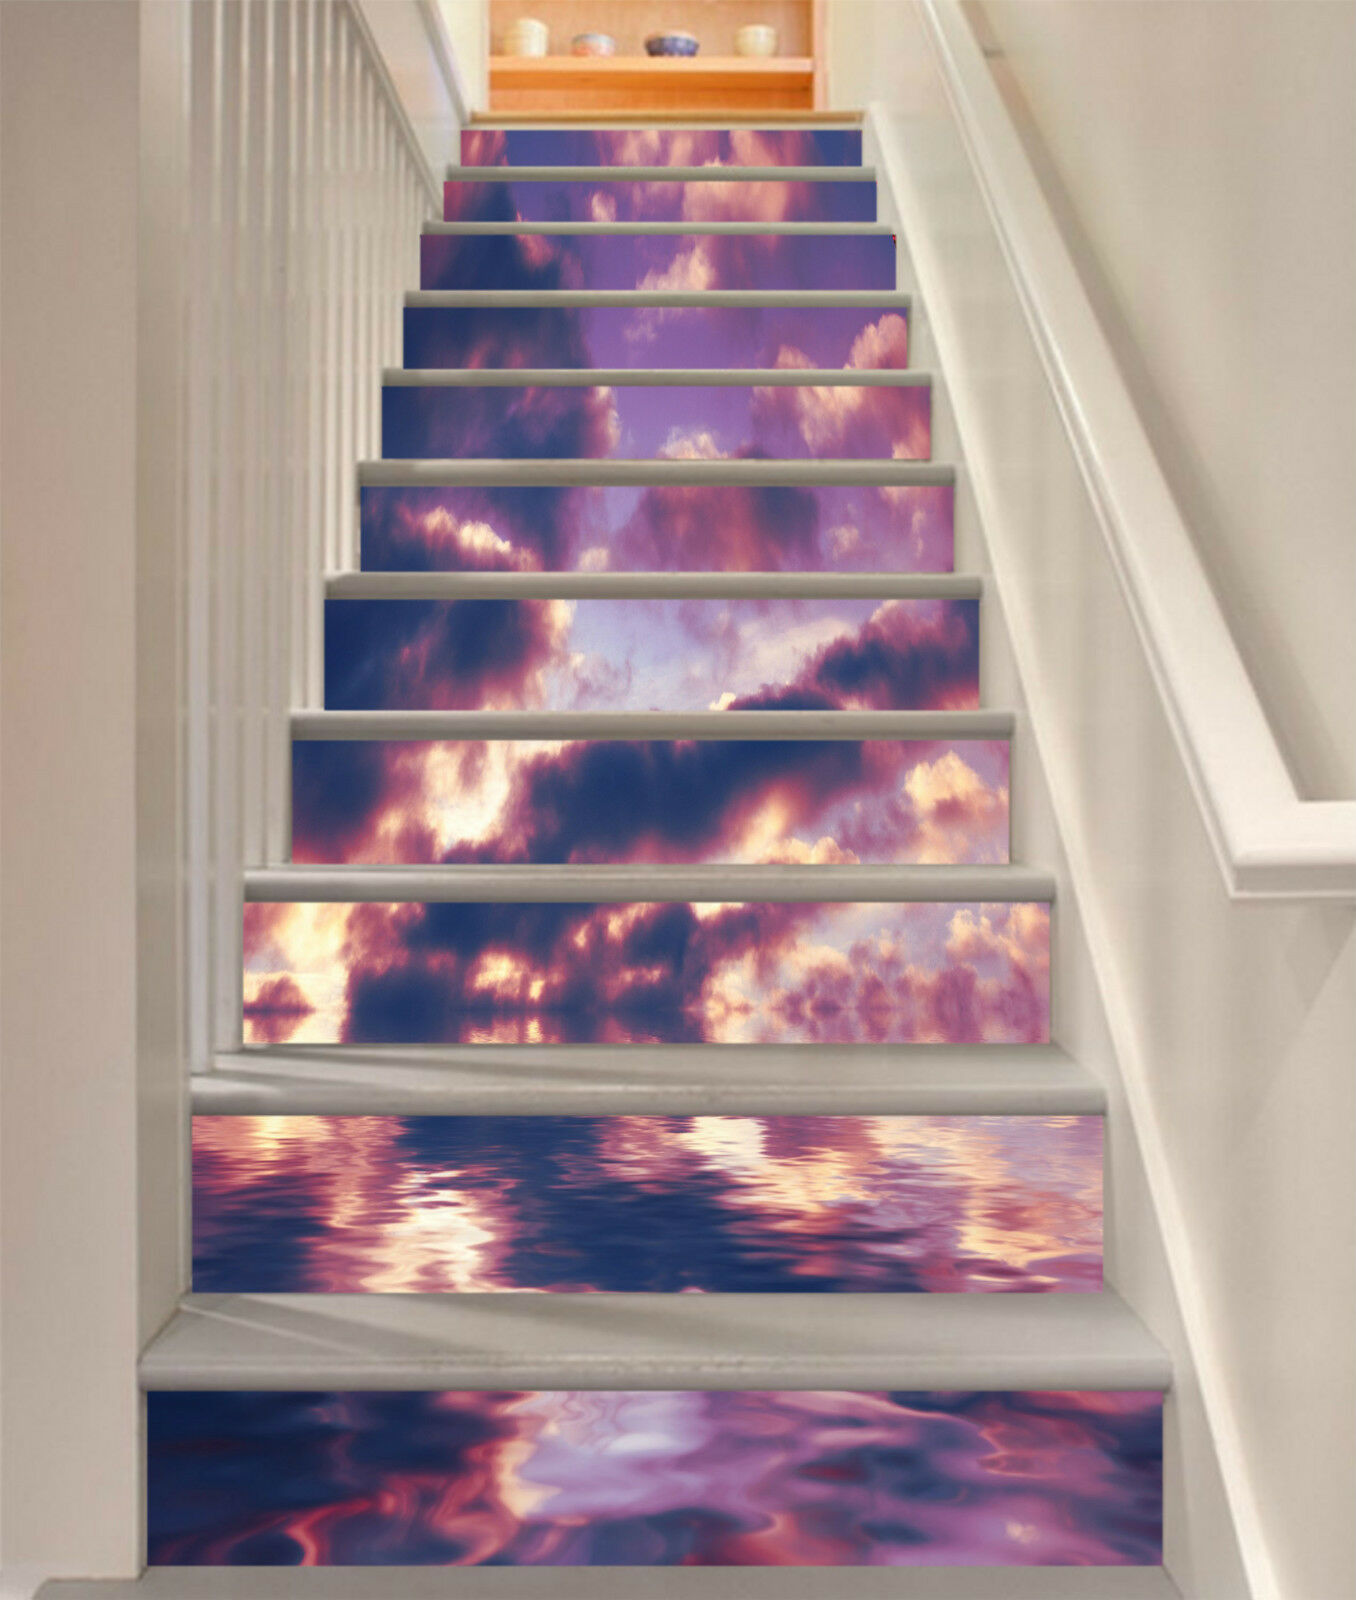 3D Schön Himmel 798 Stair Risers Dekoration Fototapete Vinyl Aufkleber Tapete DE